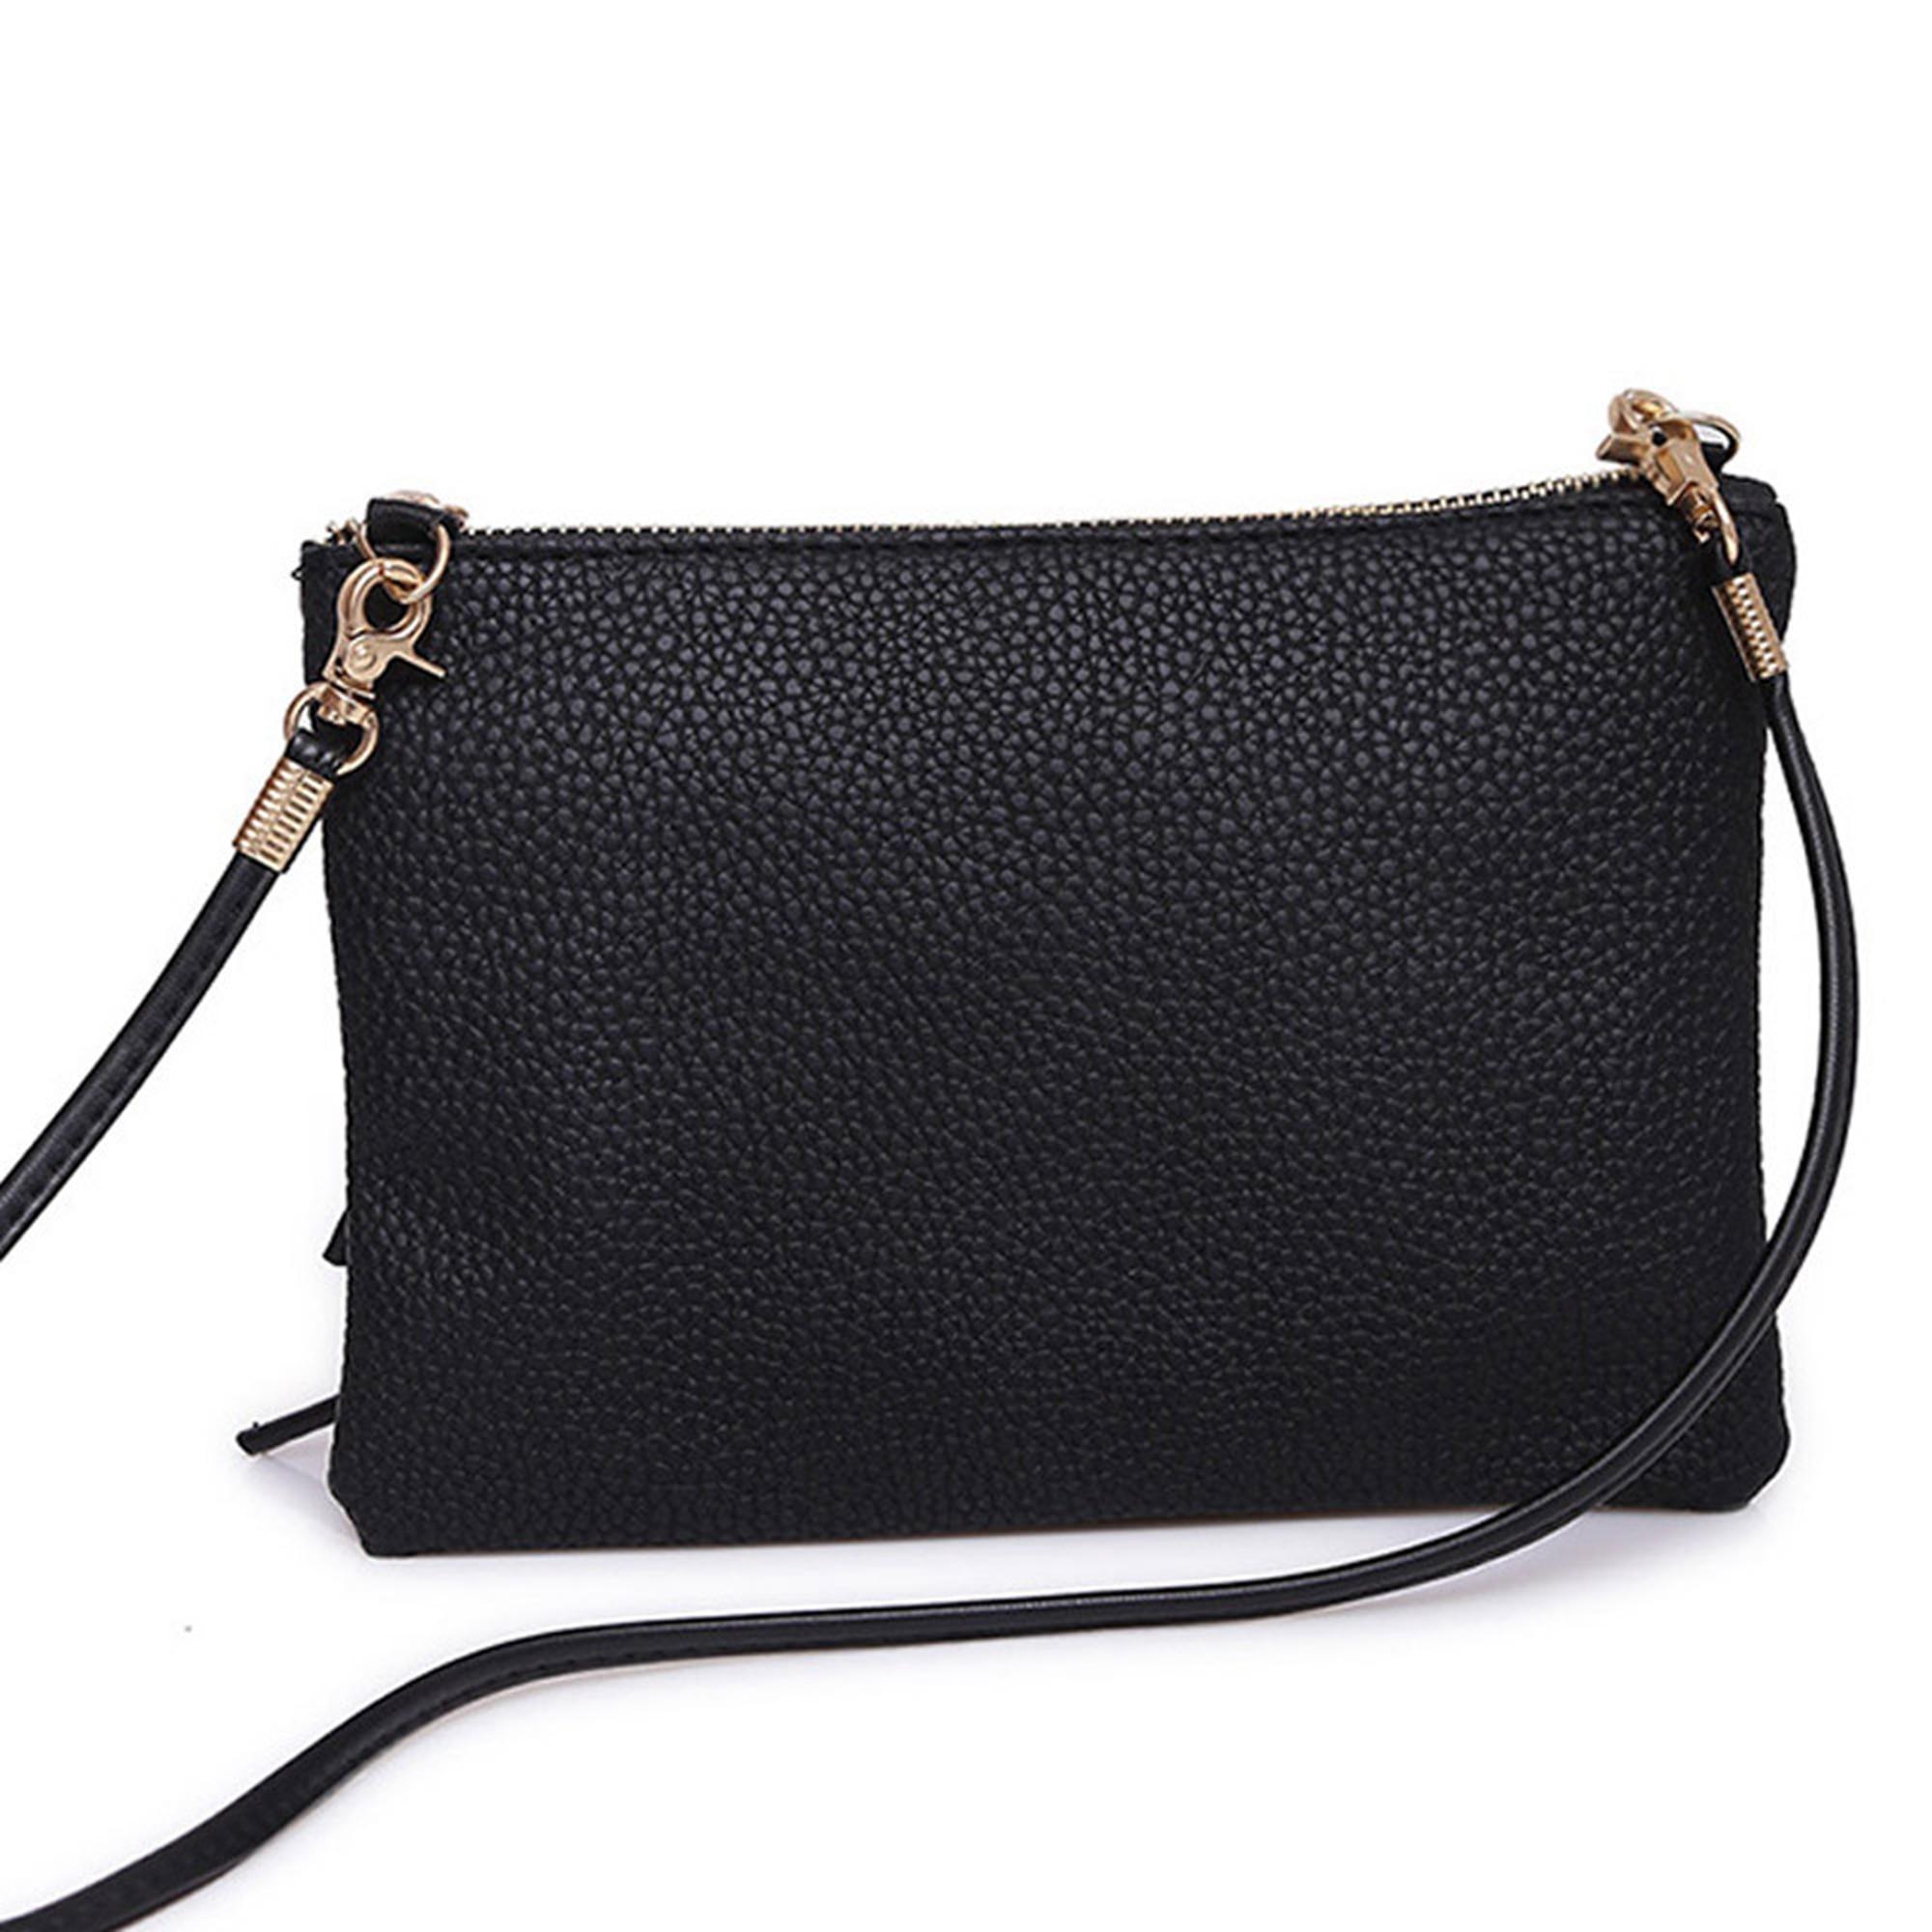 Xiniu elegant Women Messenger Bags super quality luxury Women Bags Tassels Strap Shoulder Bag Bolsa Feminina handbag #0